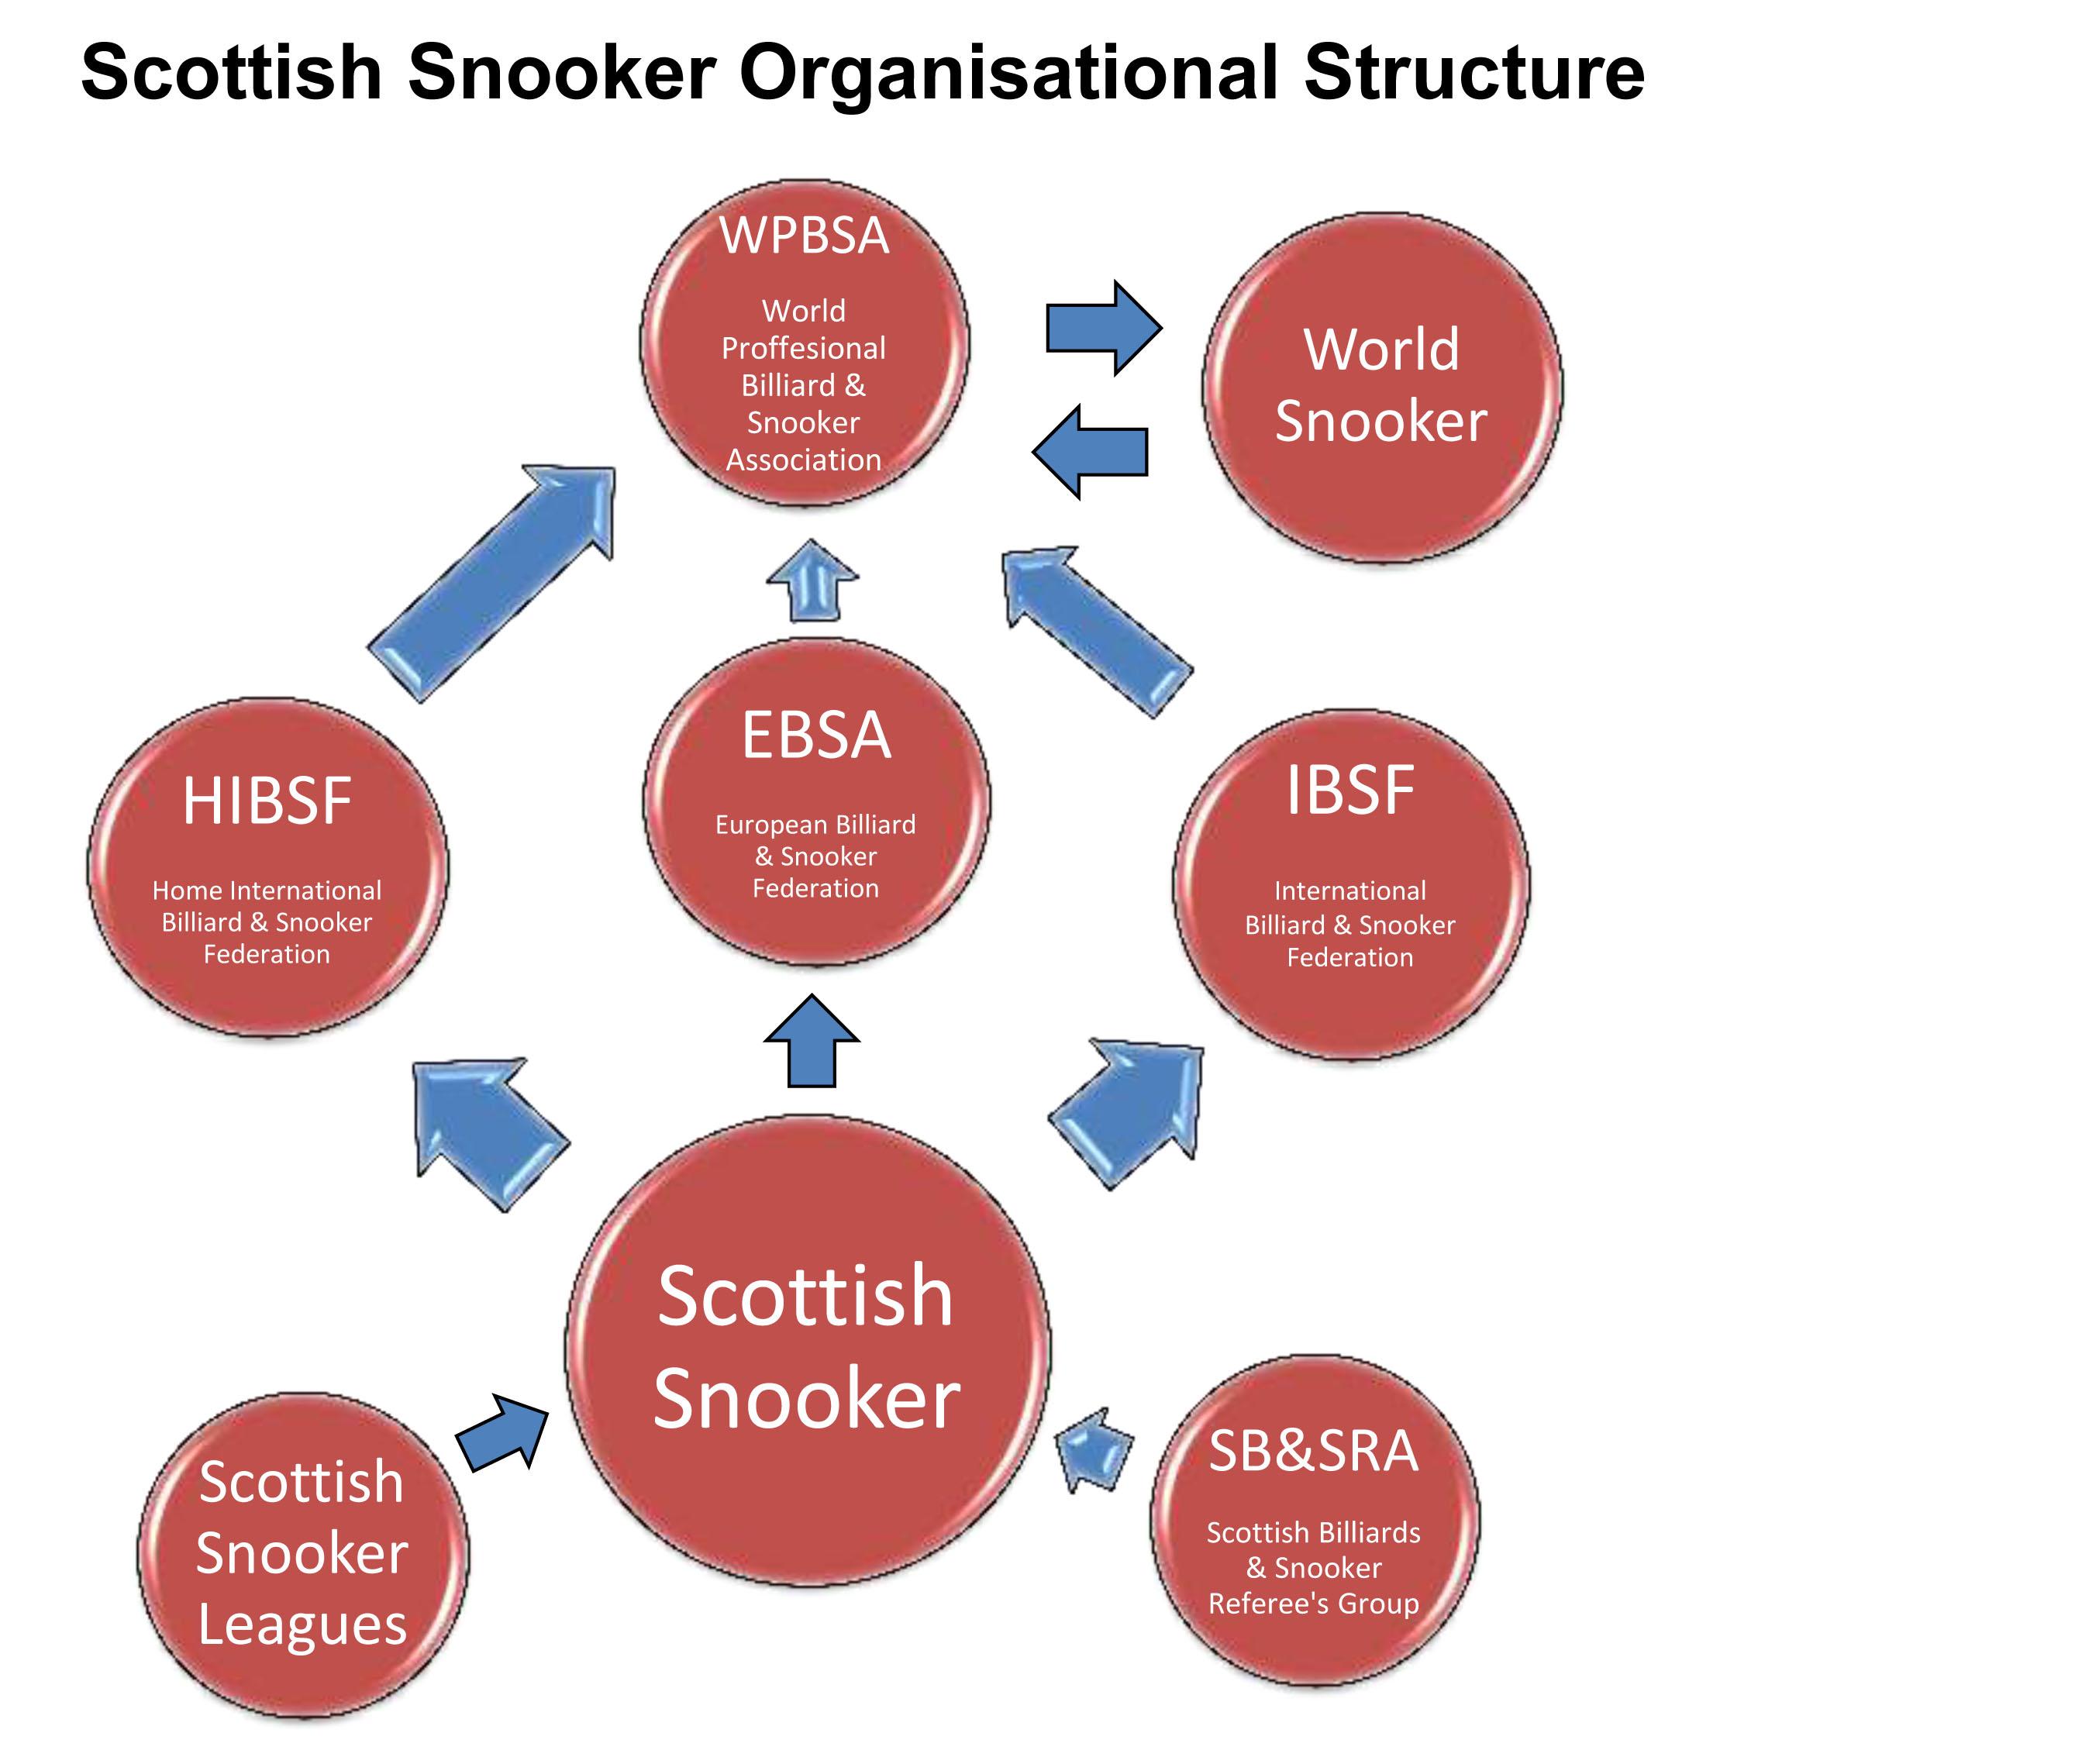 Scottish Snooker Organisational Structure